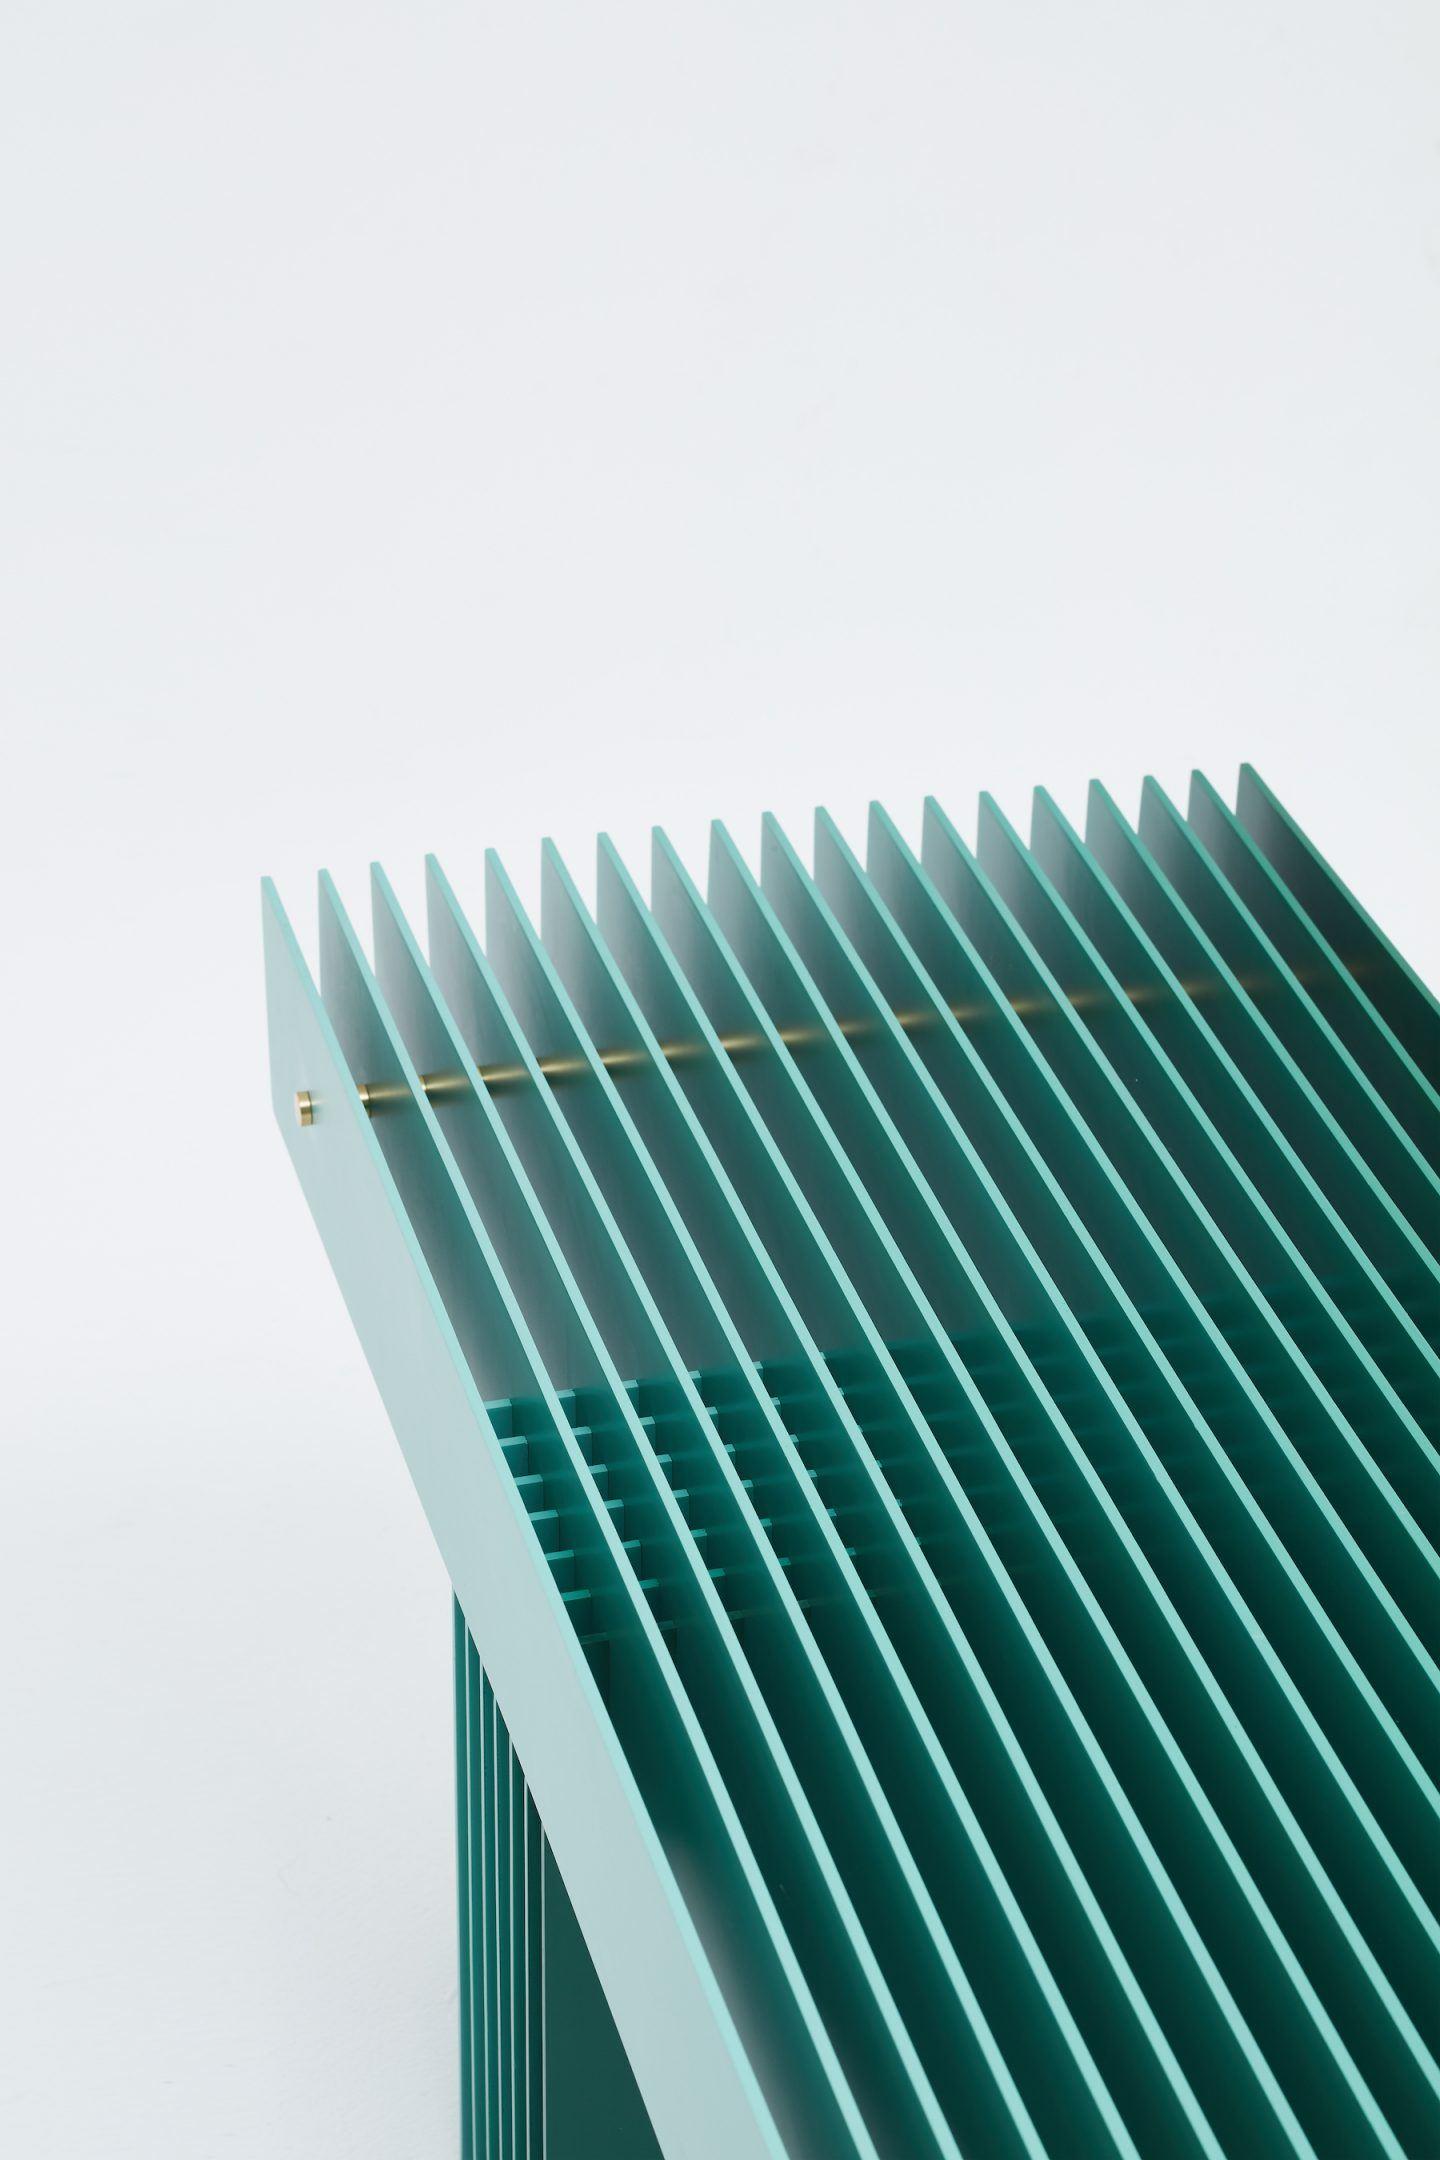 IGNANT-Design-Mario-Tsai-Grid-Bench-08